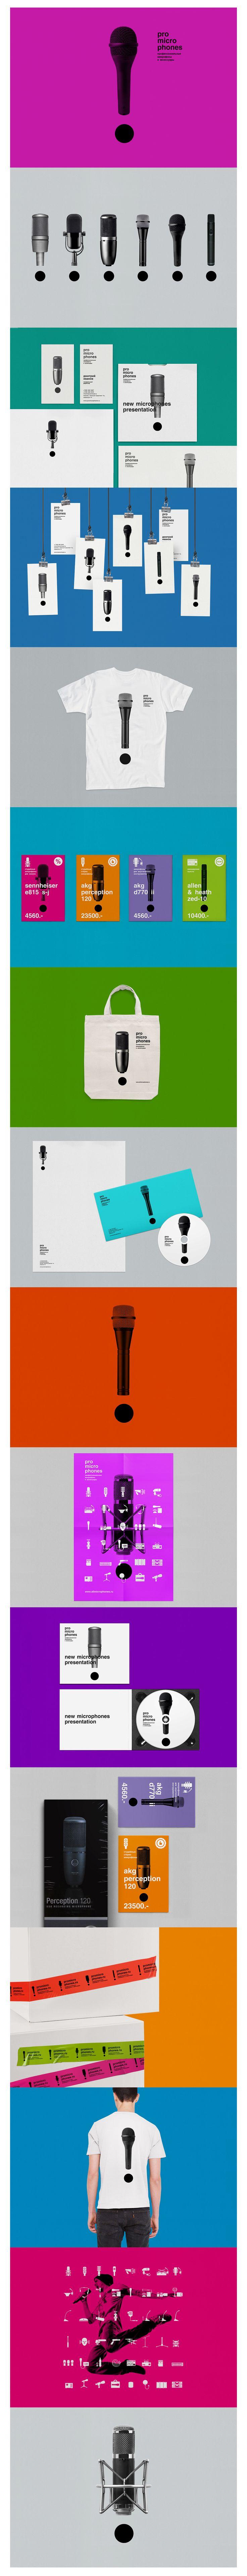 Promicrophones, Identity © Vova Lifanov  design identity #packaging #branding #marketing PD